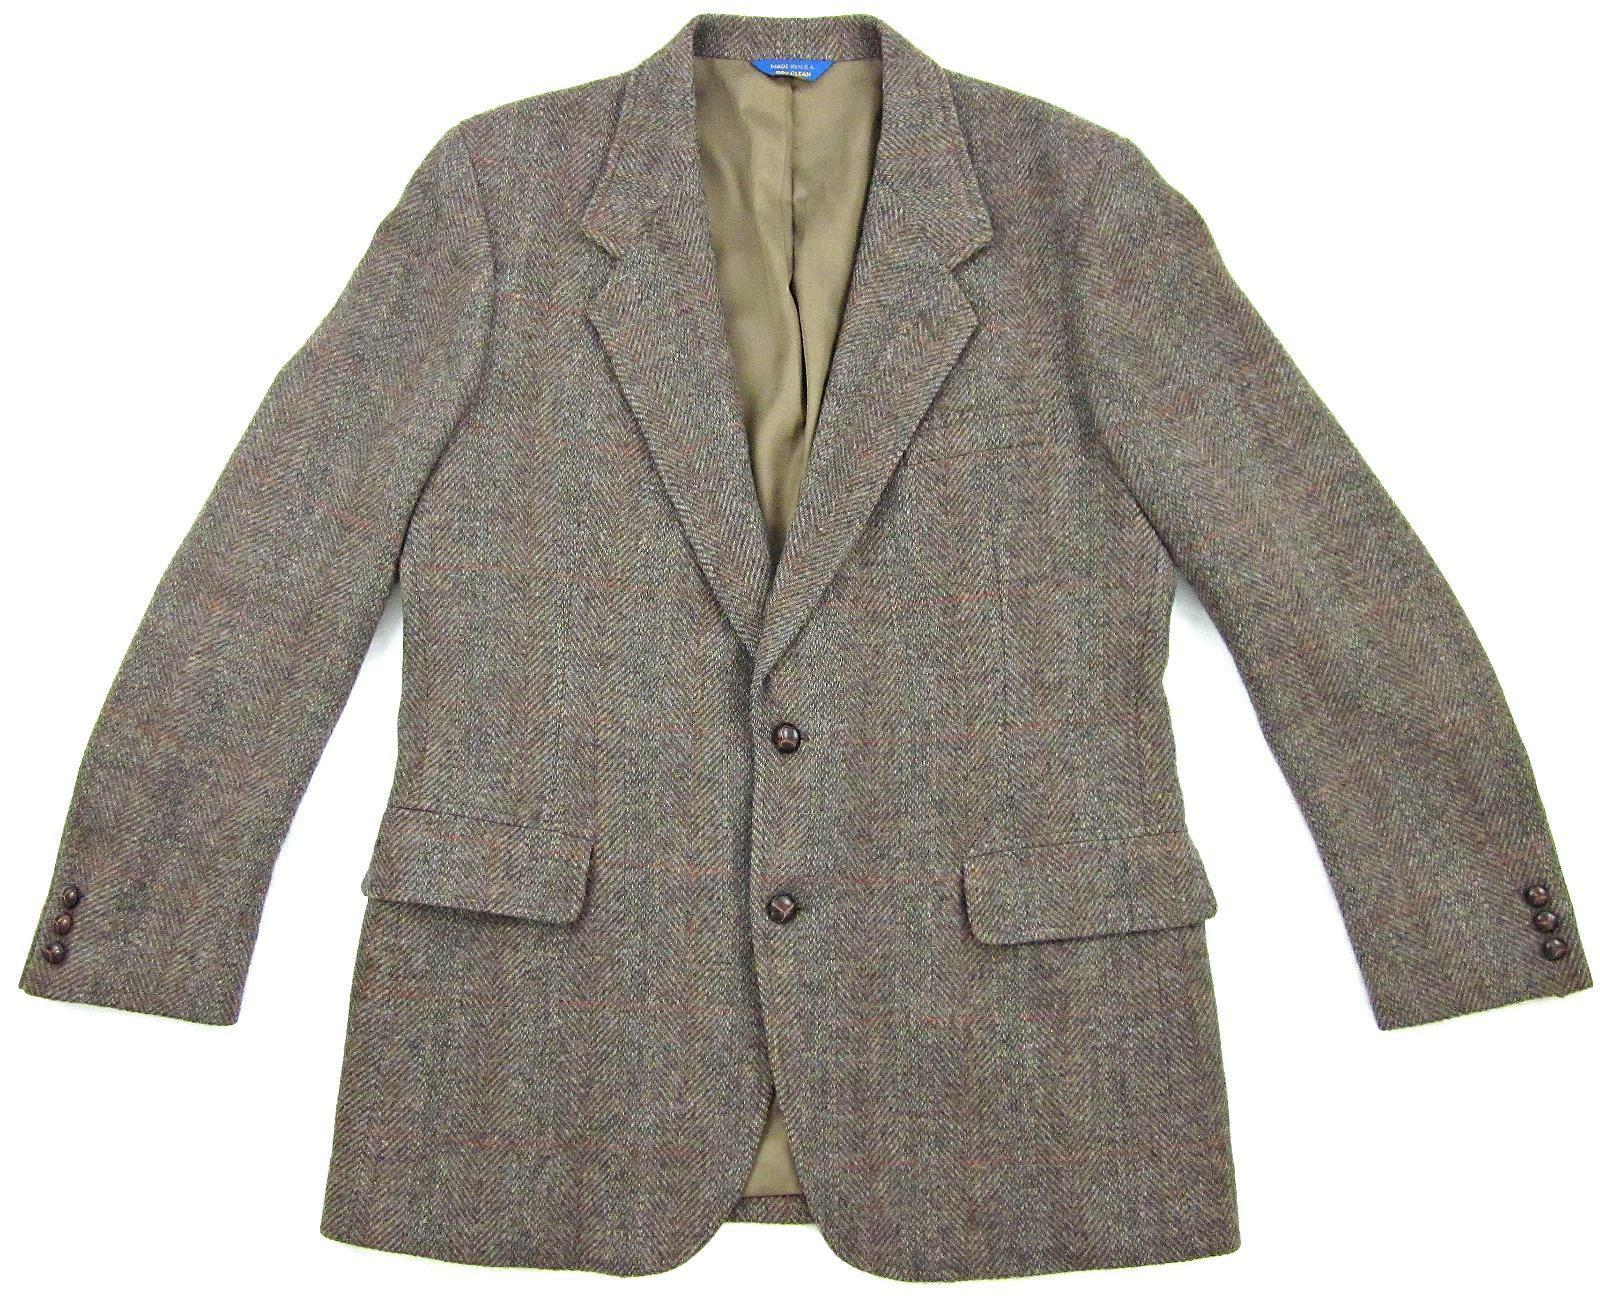 Pendleton Sports Coat Braun Herringbone Virgin Wool 44L Long Made in USA